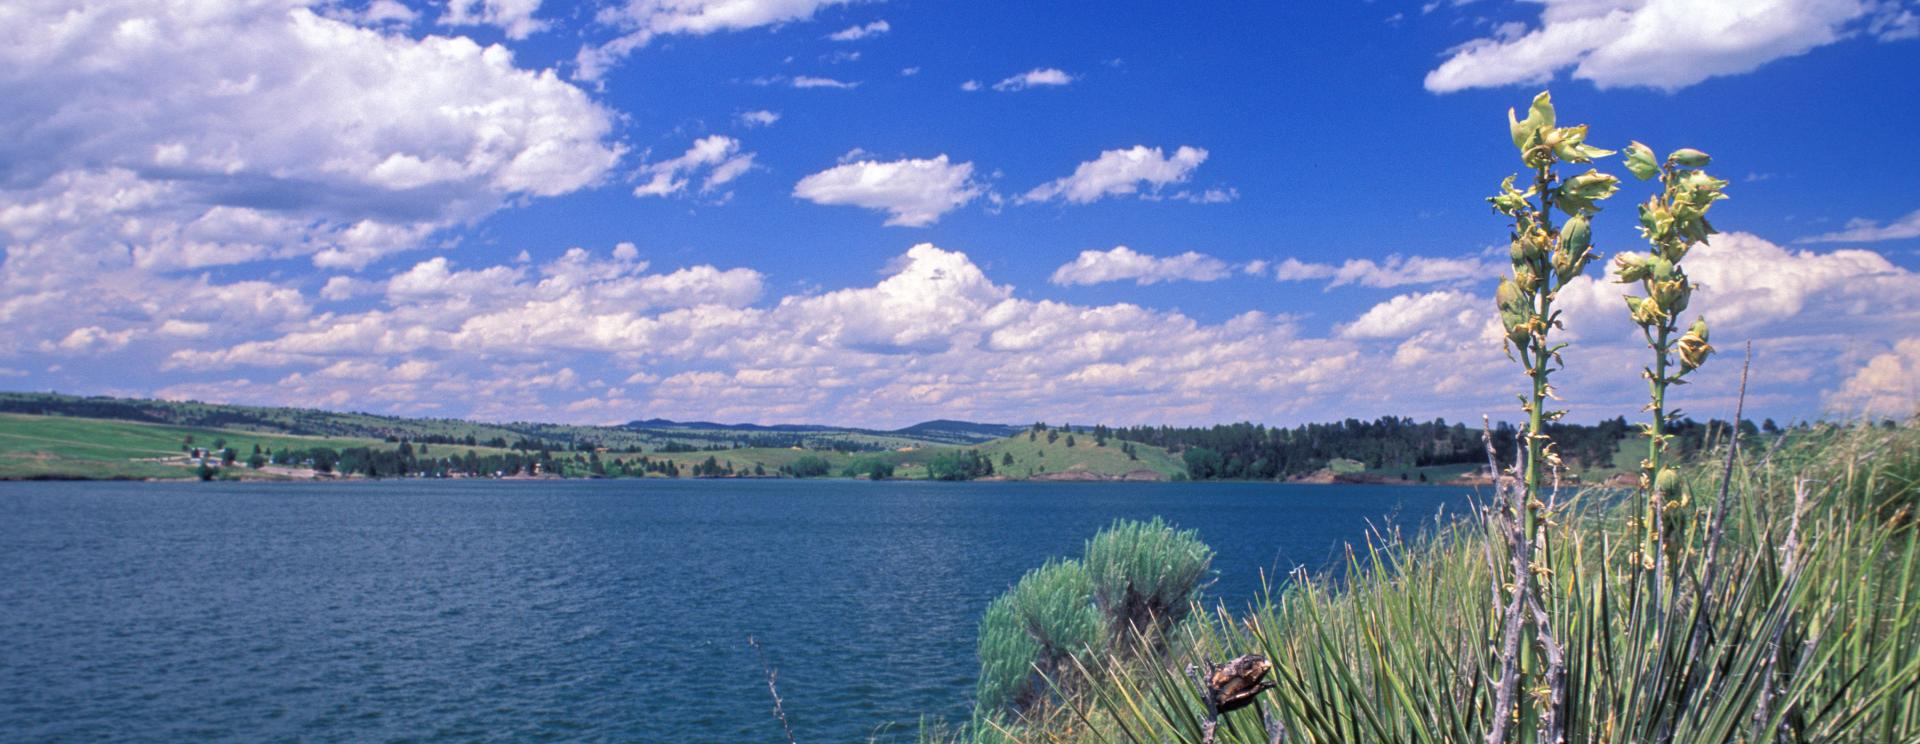 Sheps Canyon Recreation Area